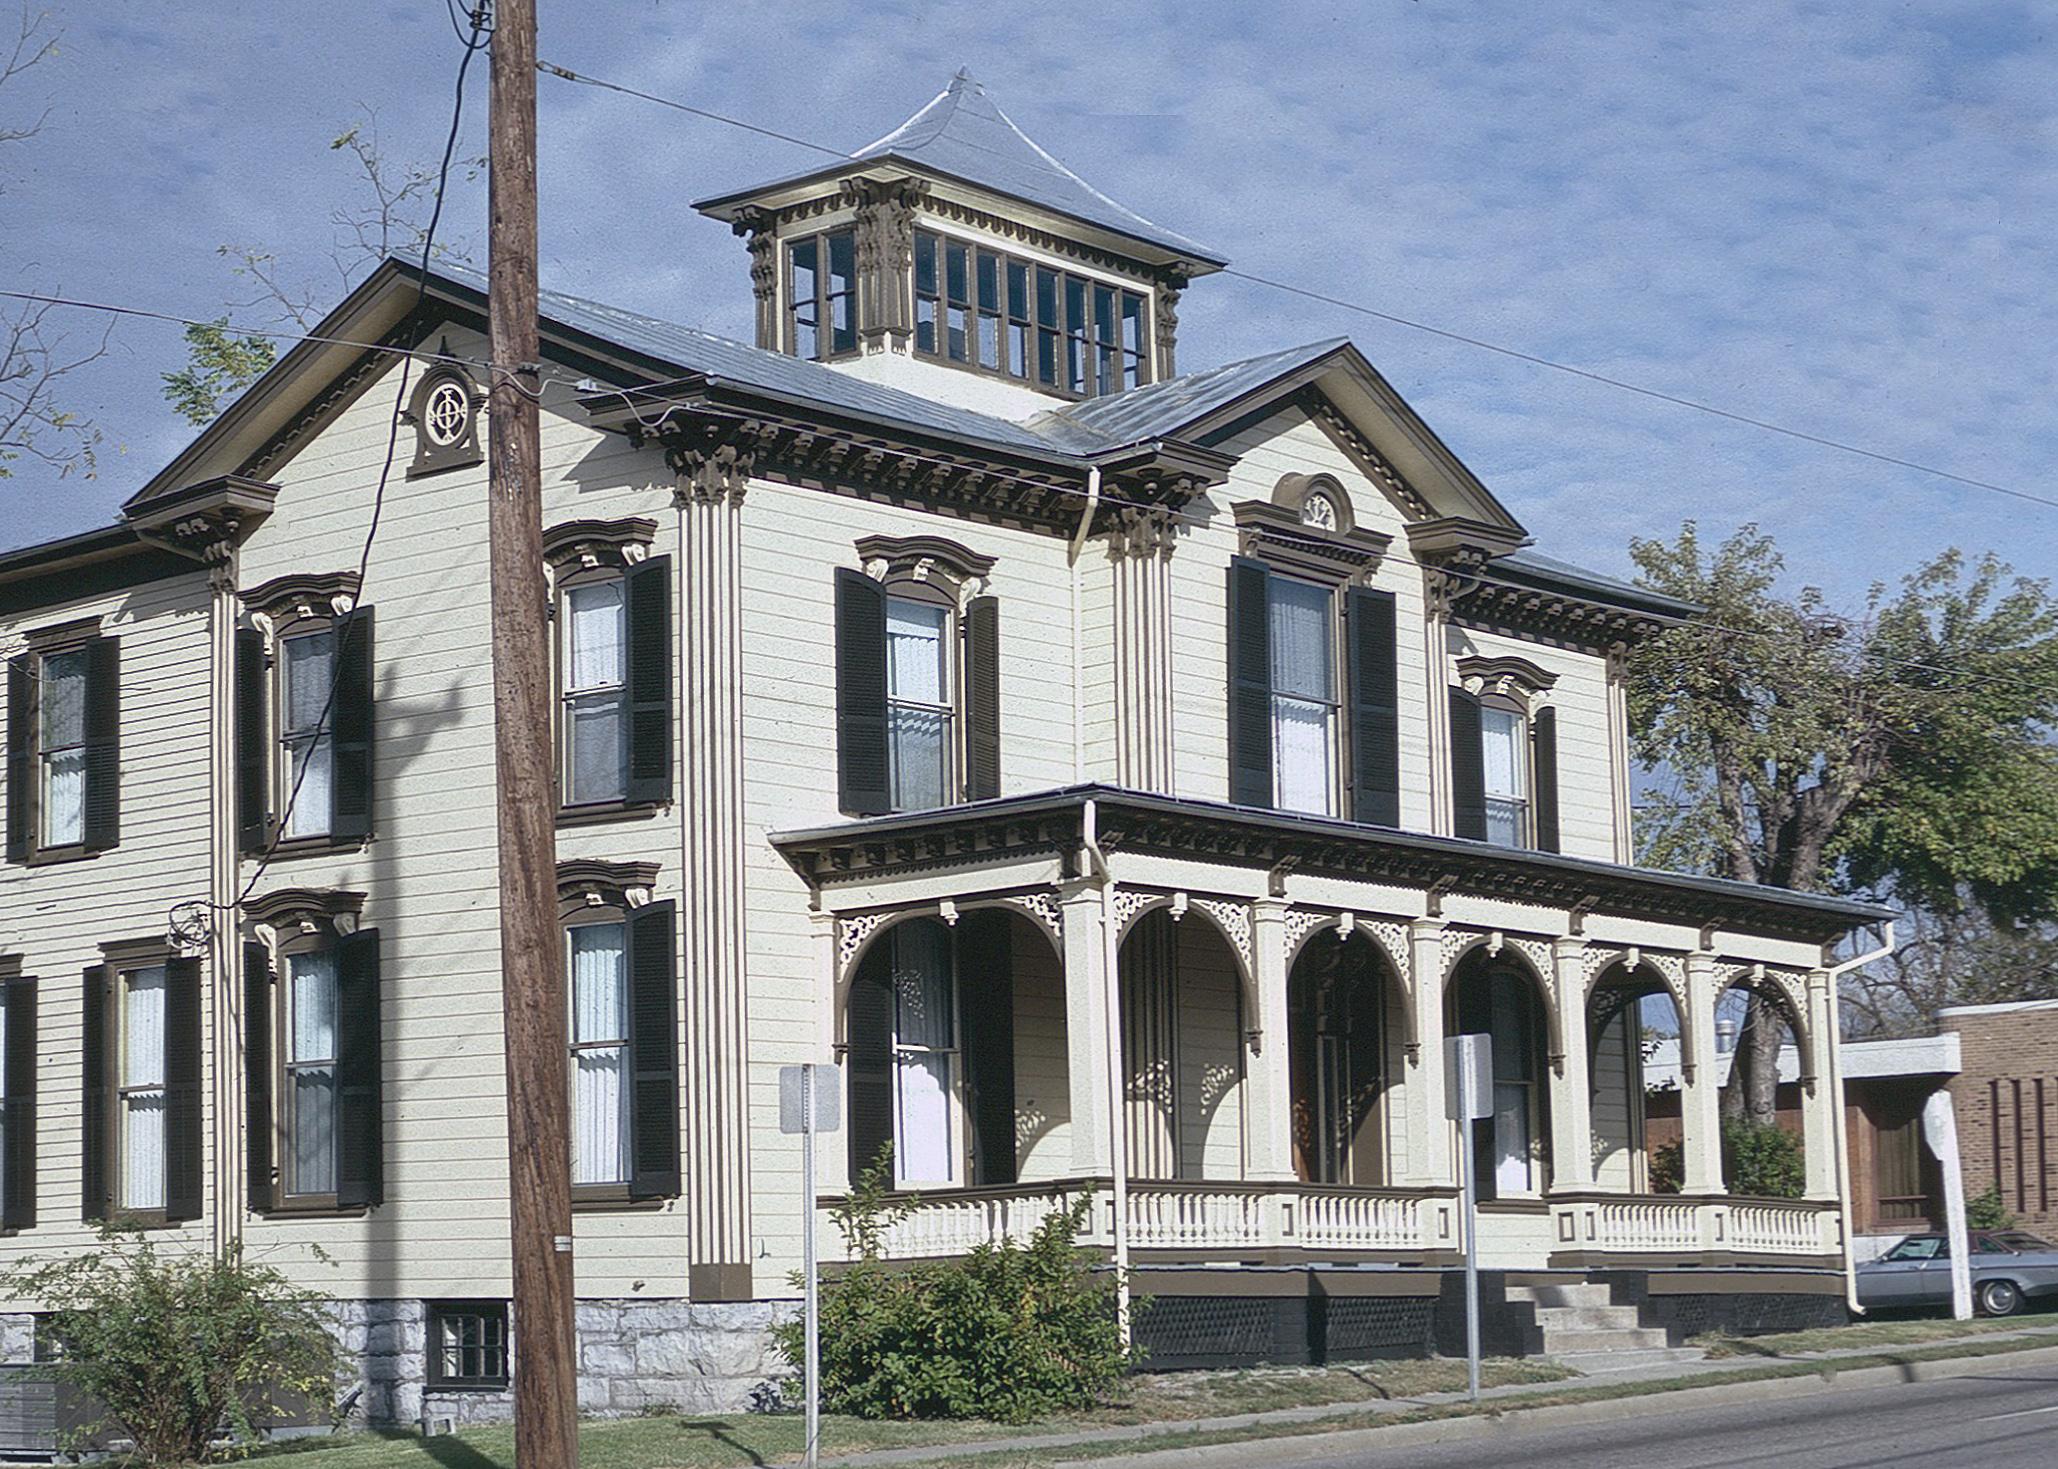 Anthony Hockman House